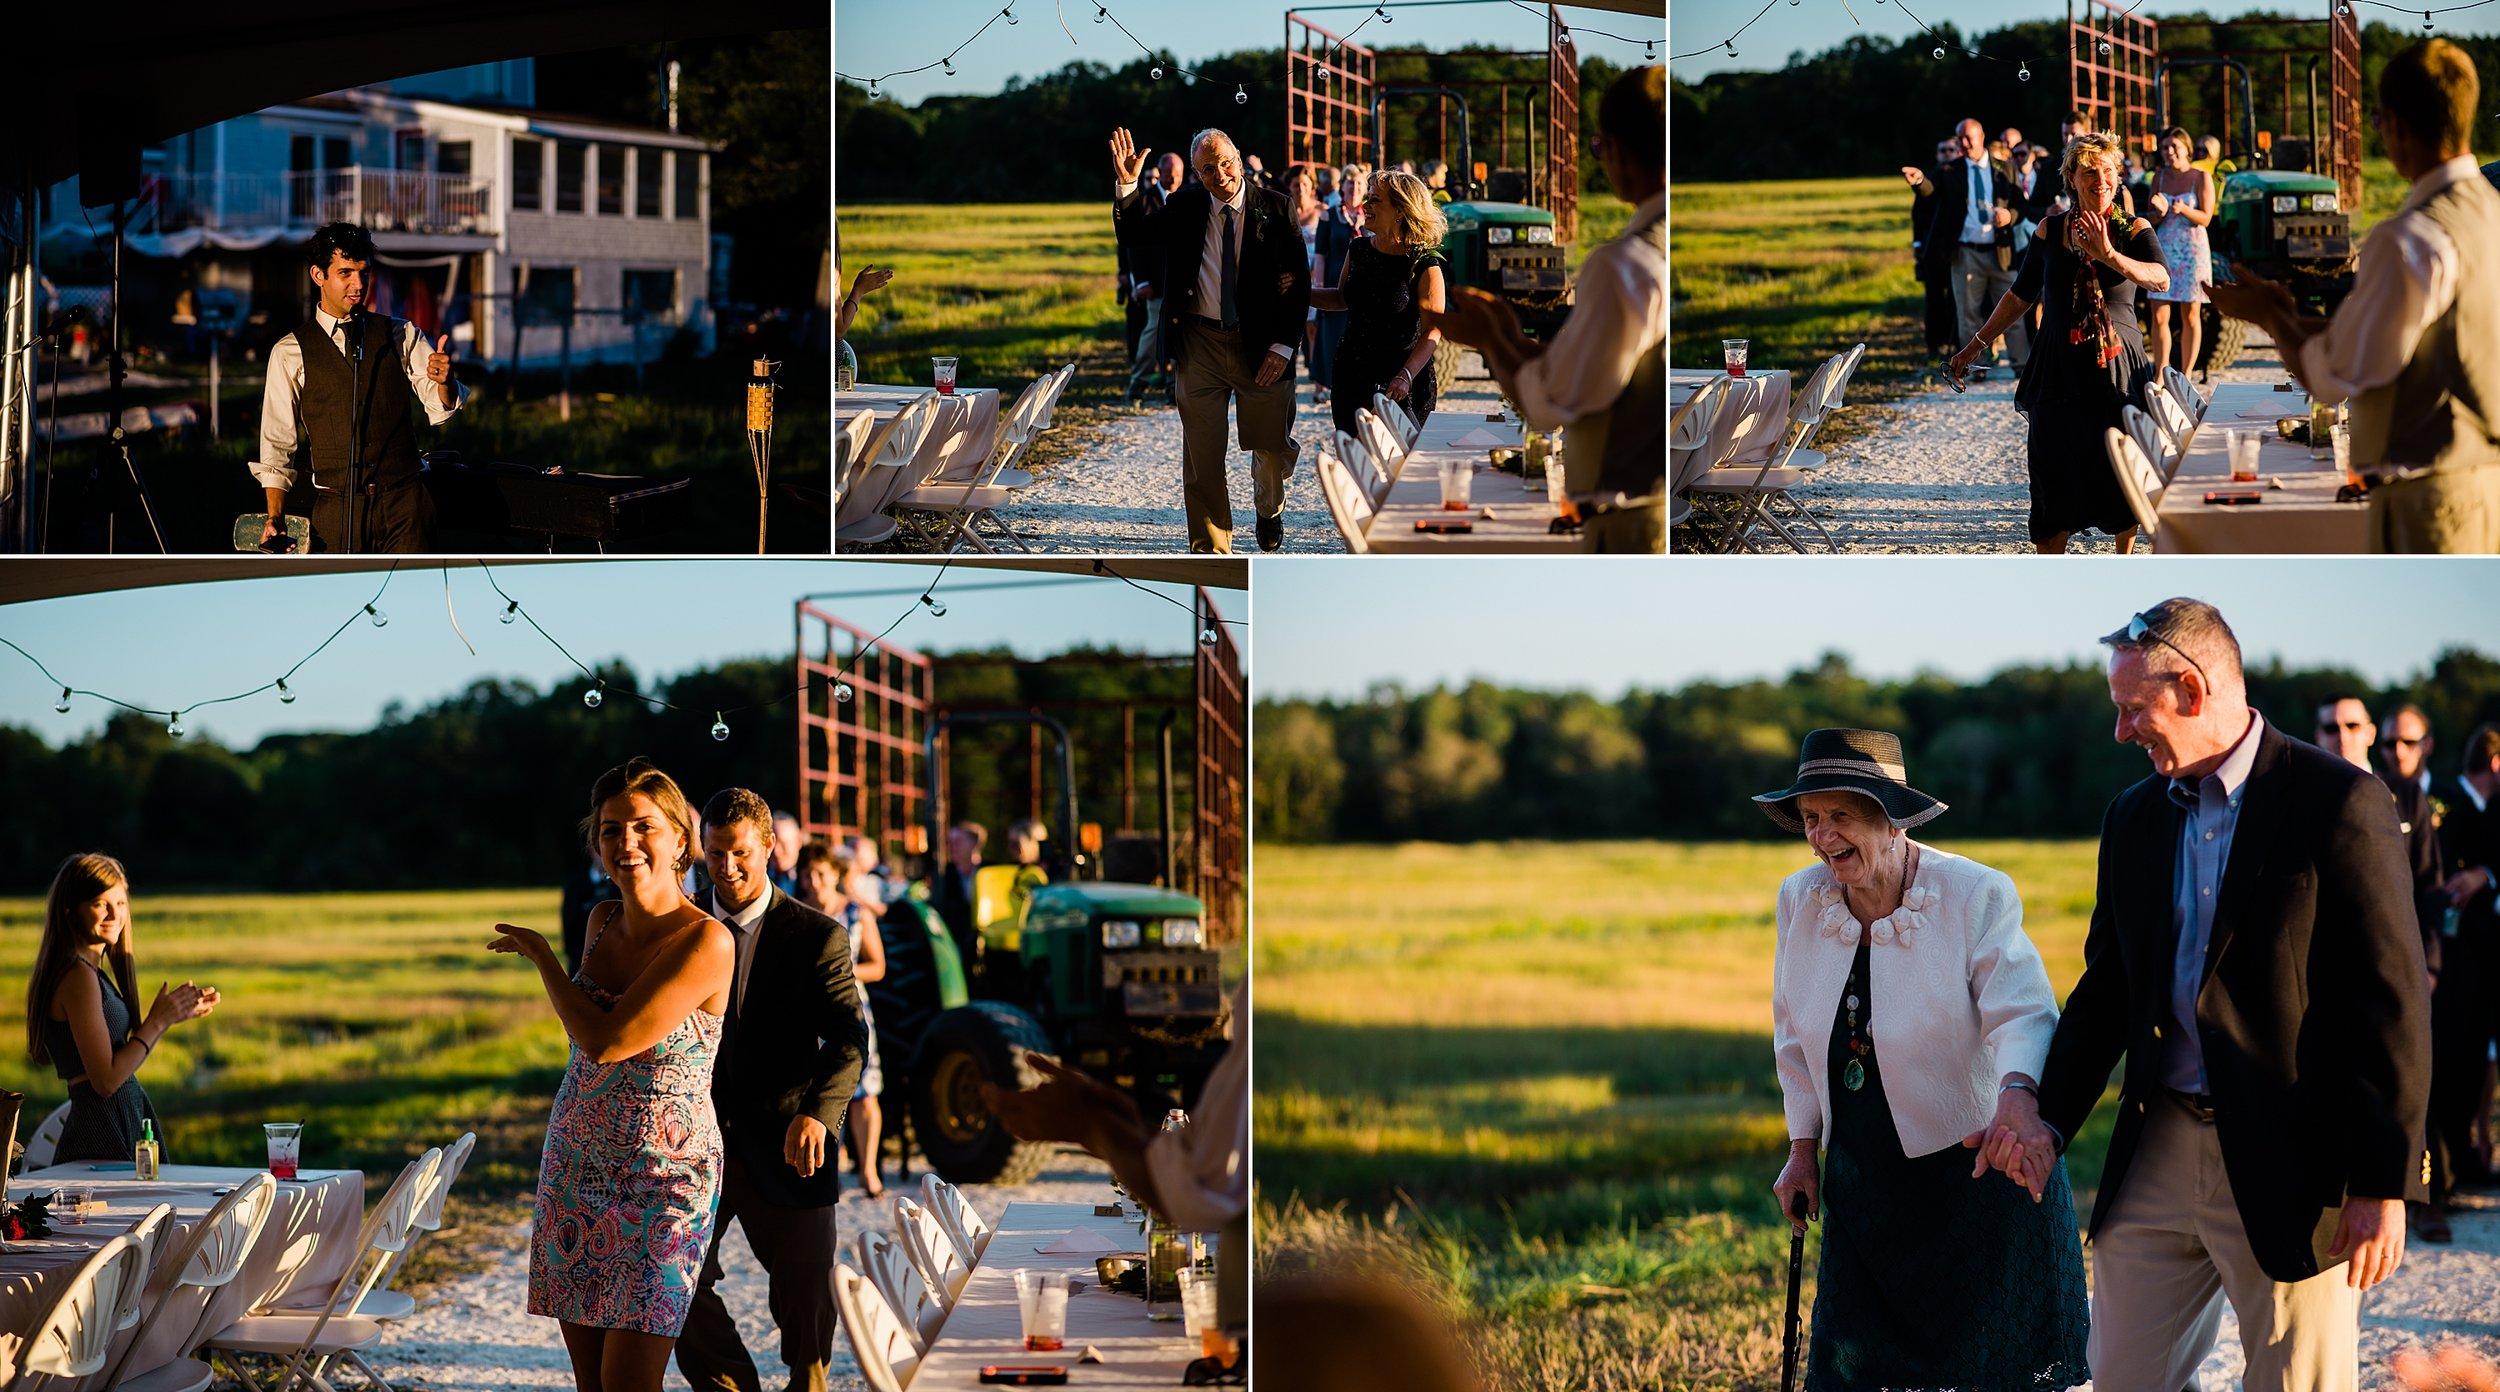 074 los angeles wedding photographer.jpg